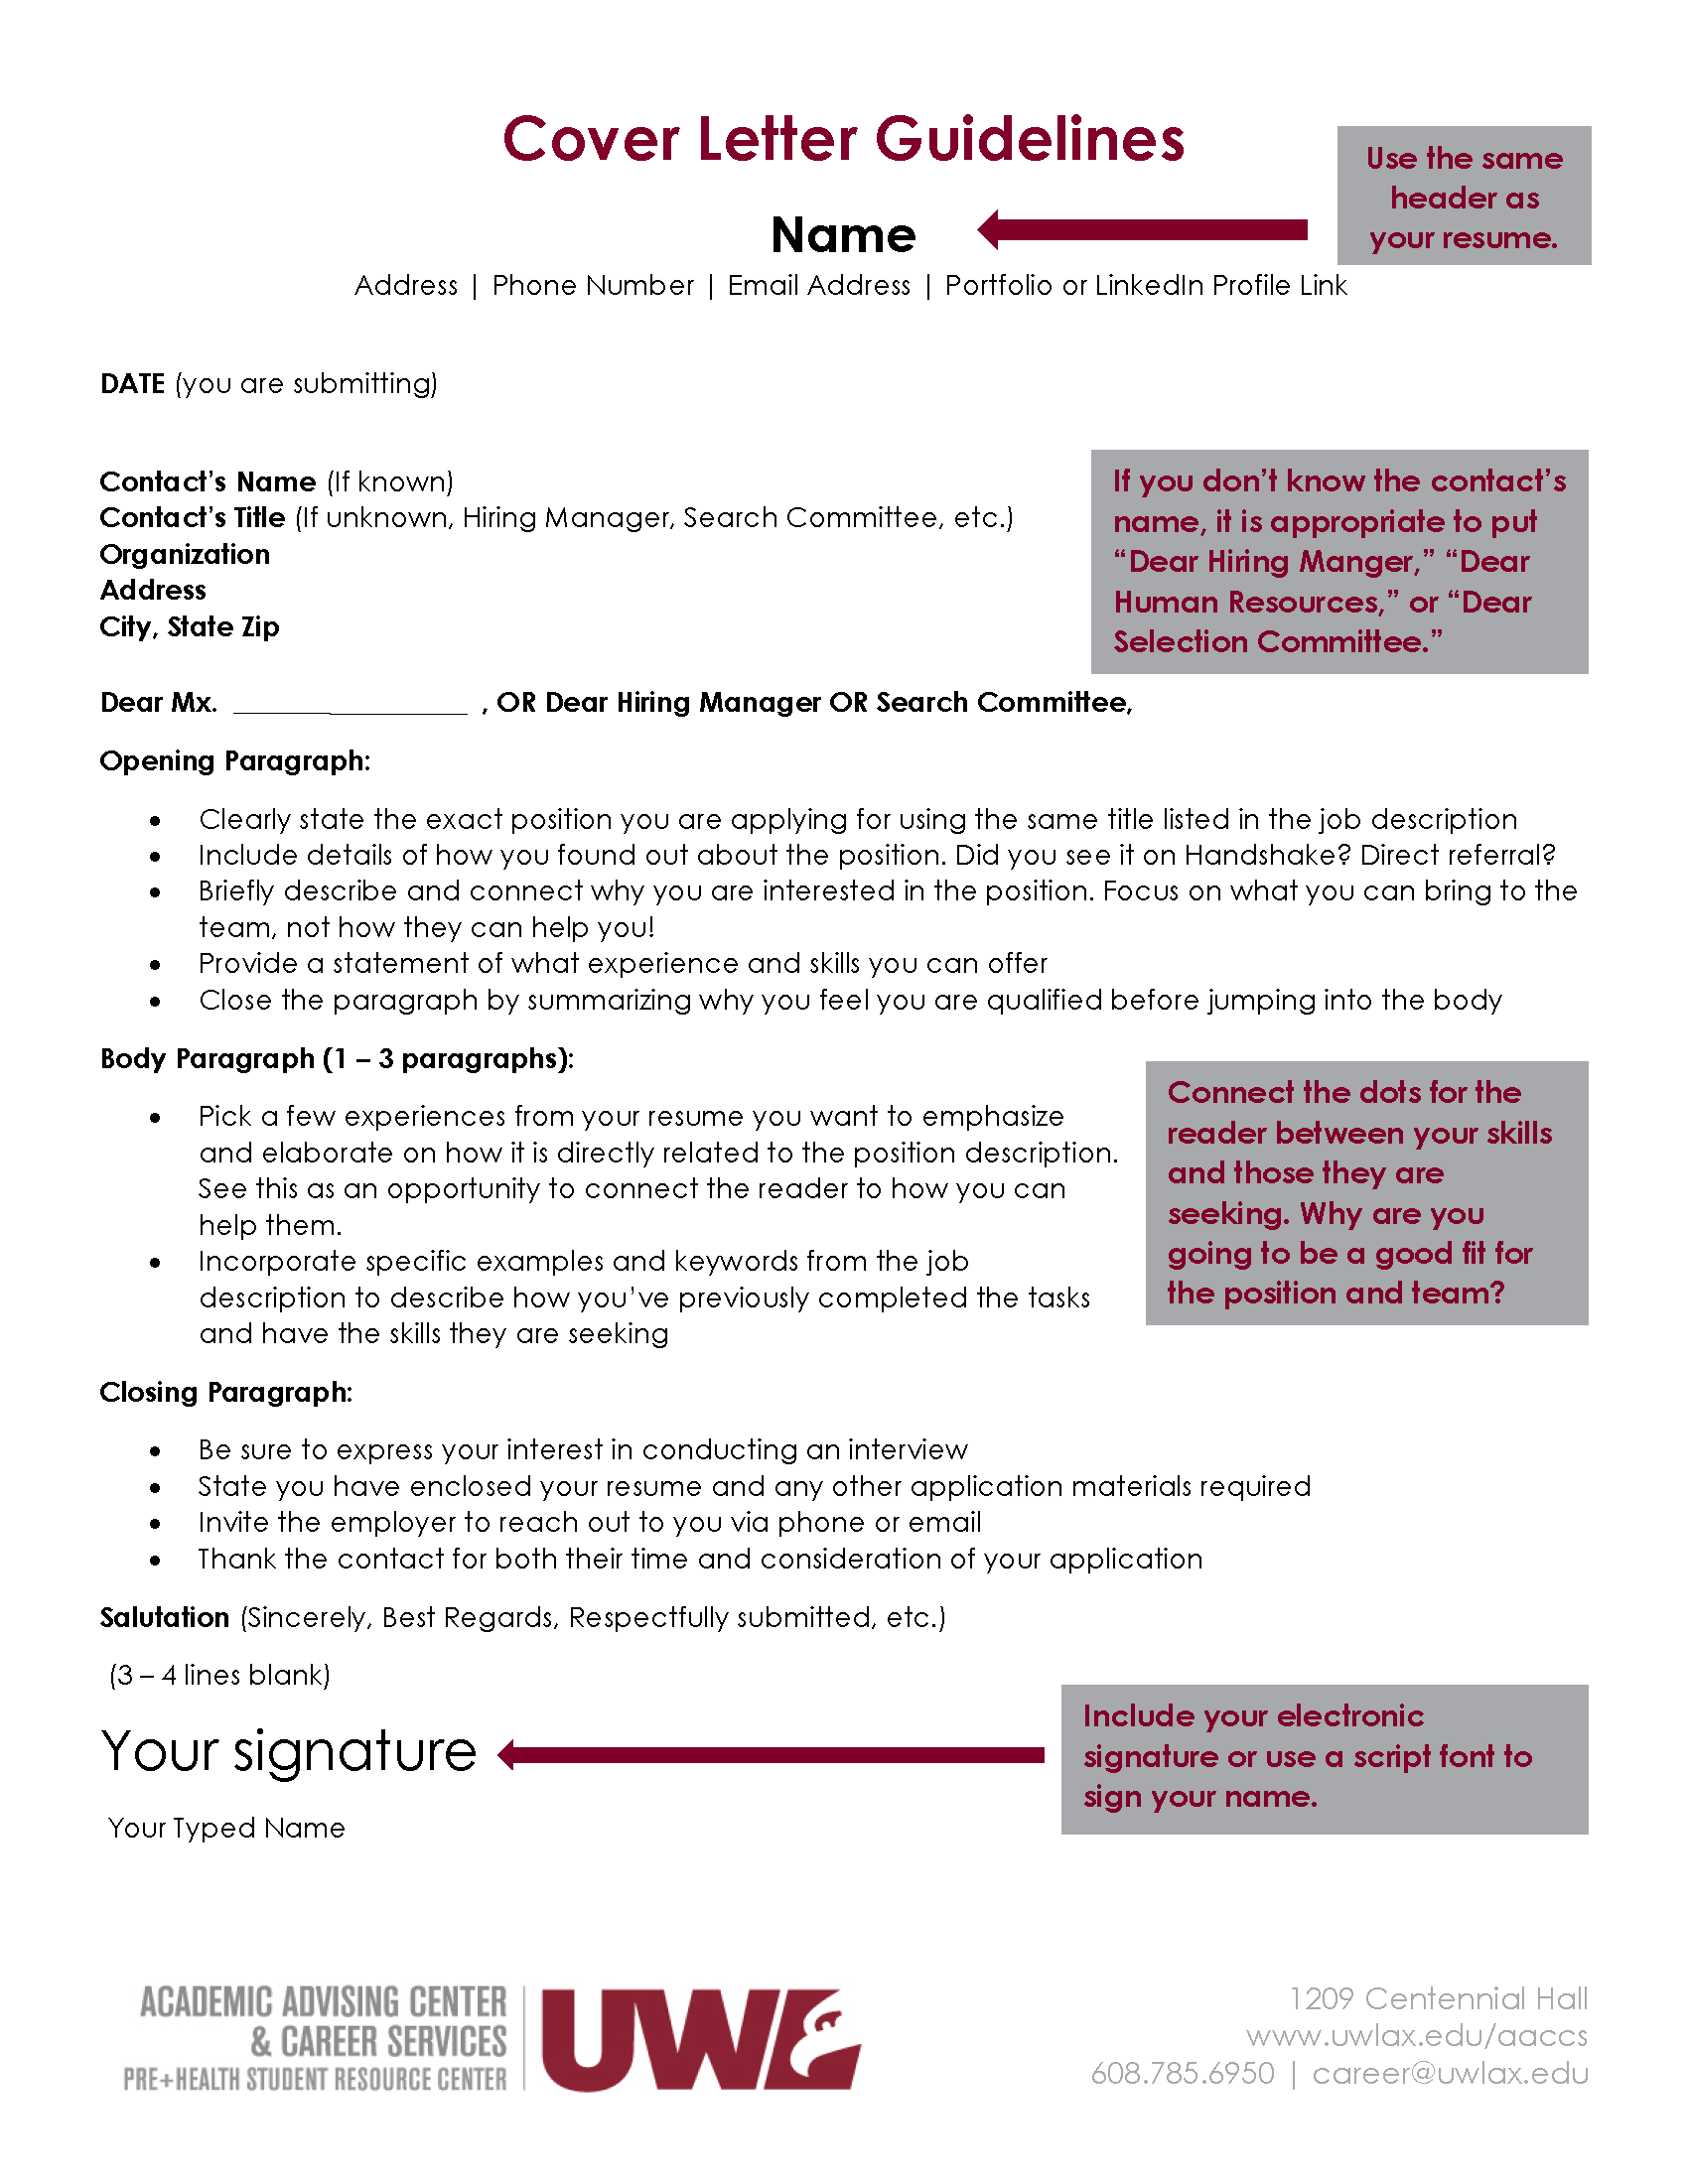 Searching for jobs/internships – Academic Advising Center ...